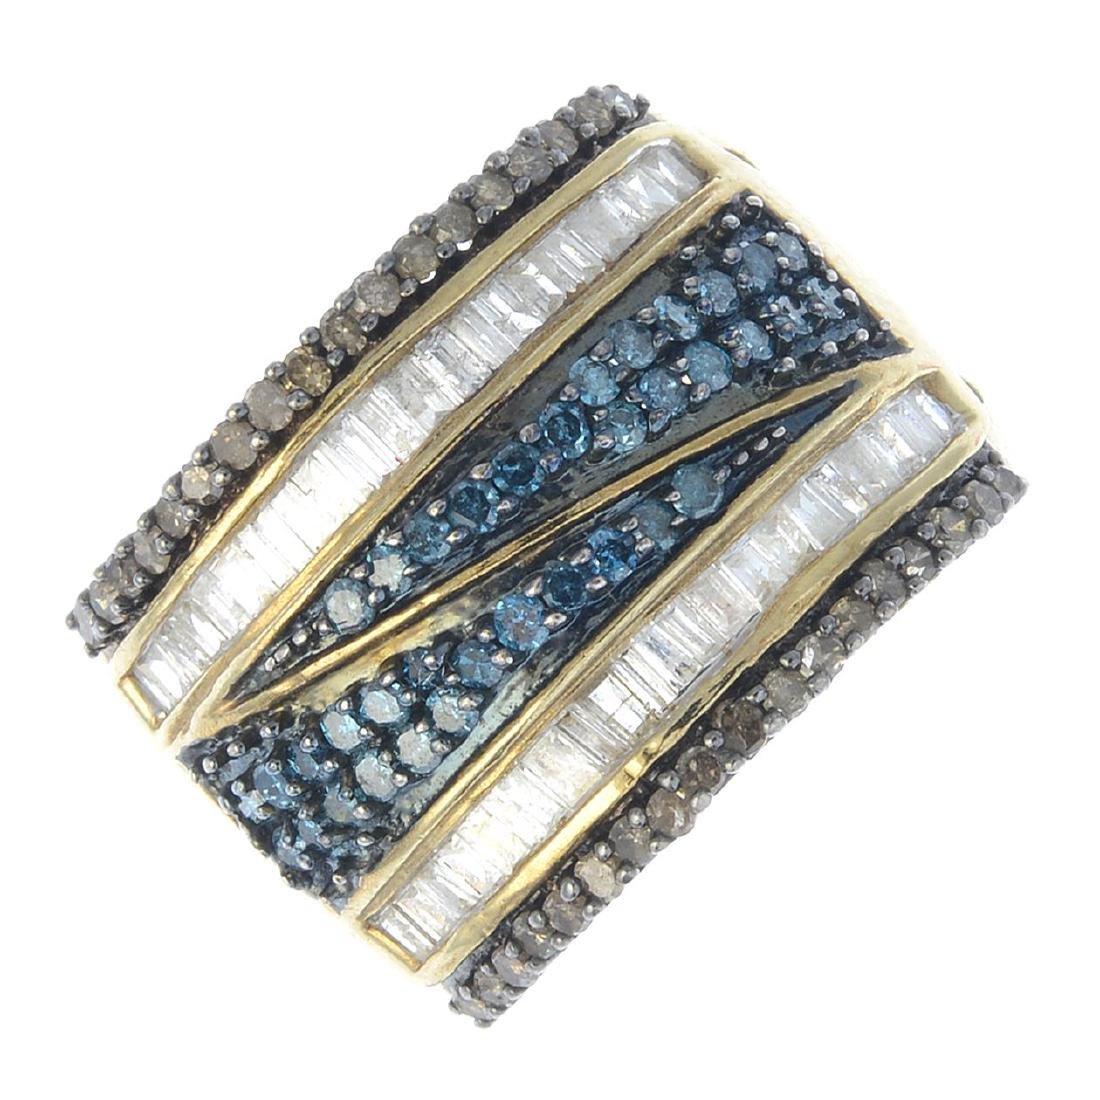 A 'coloured' diamond and diamond ring. The single-cut